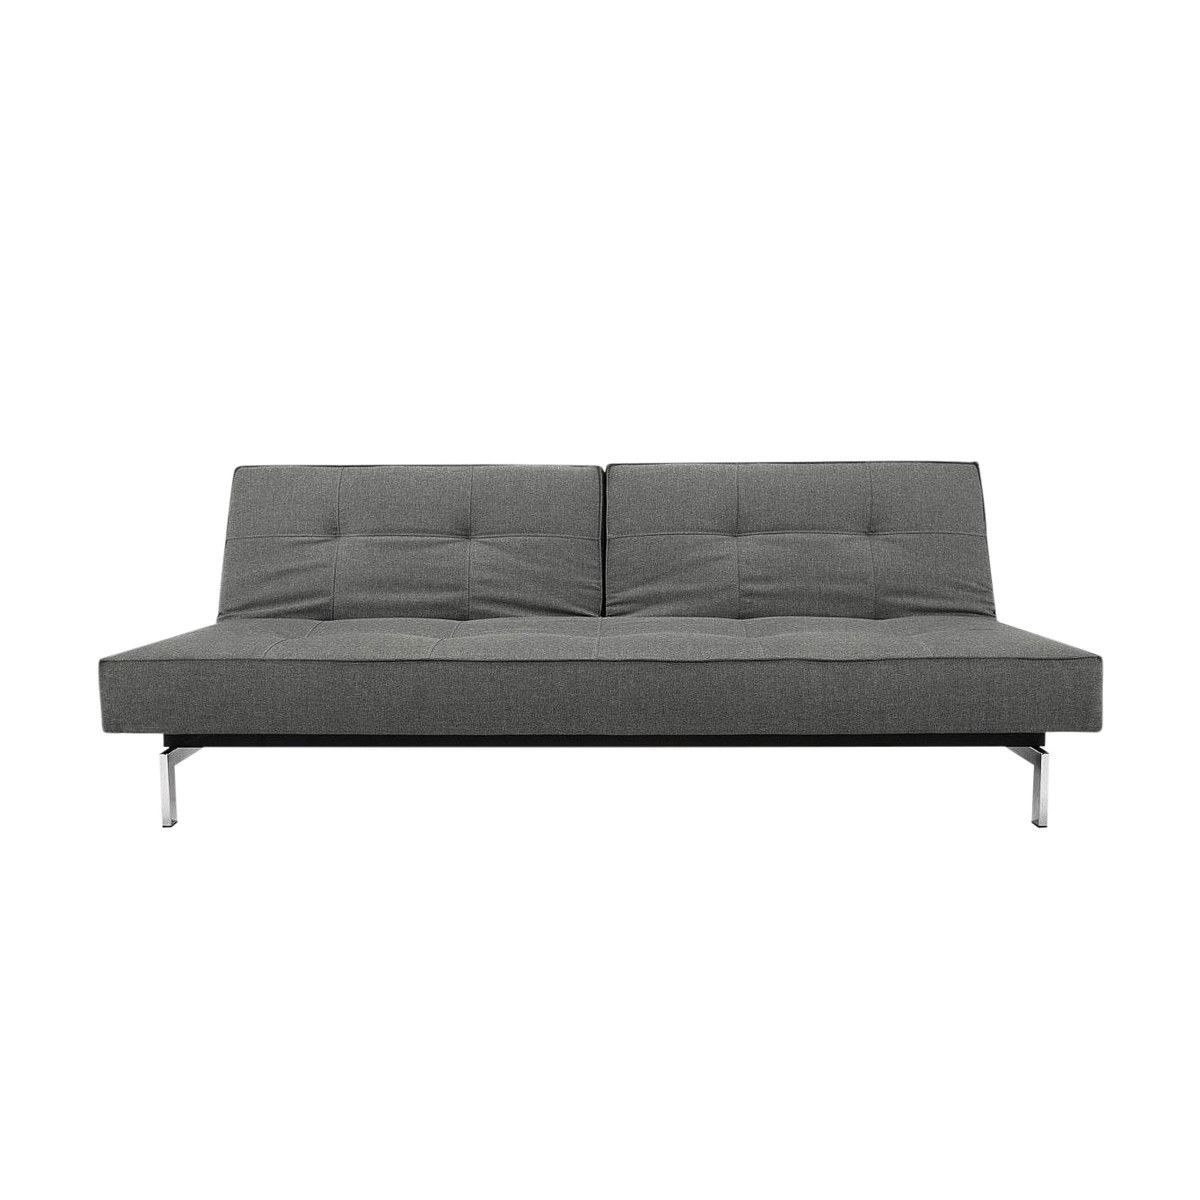 Splitback Sofa Bed Chrome Innovation Ambientedirect Com